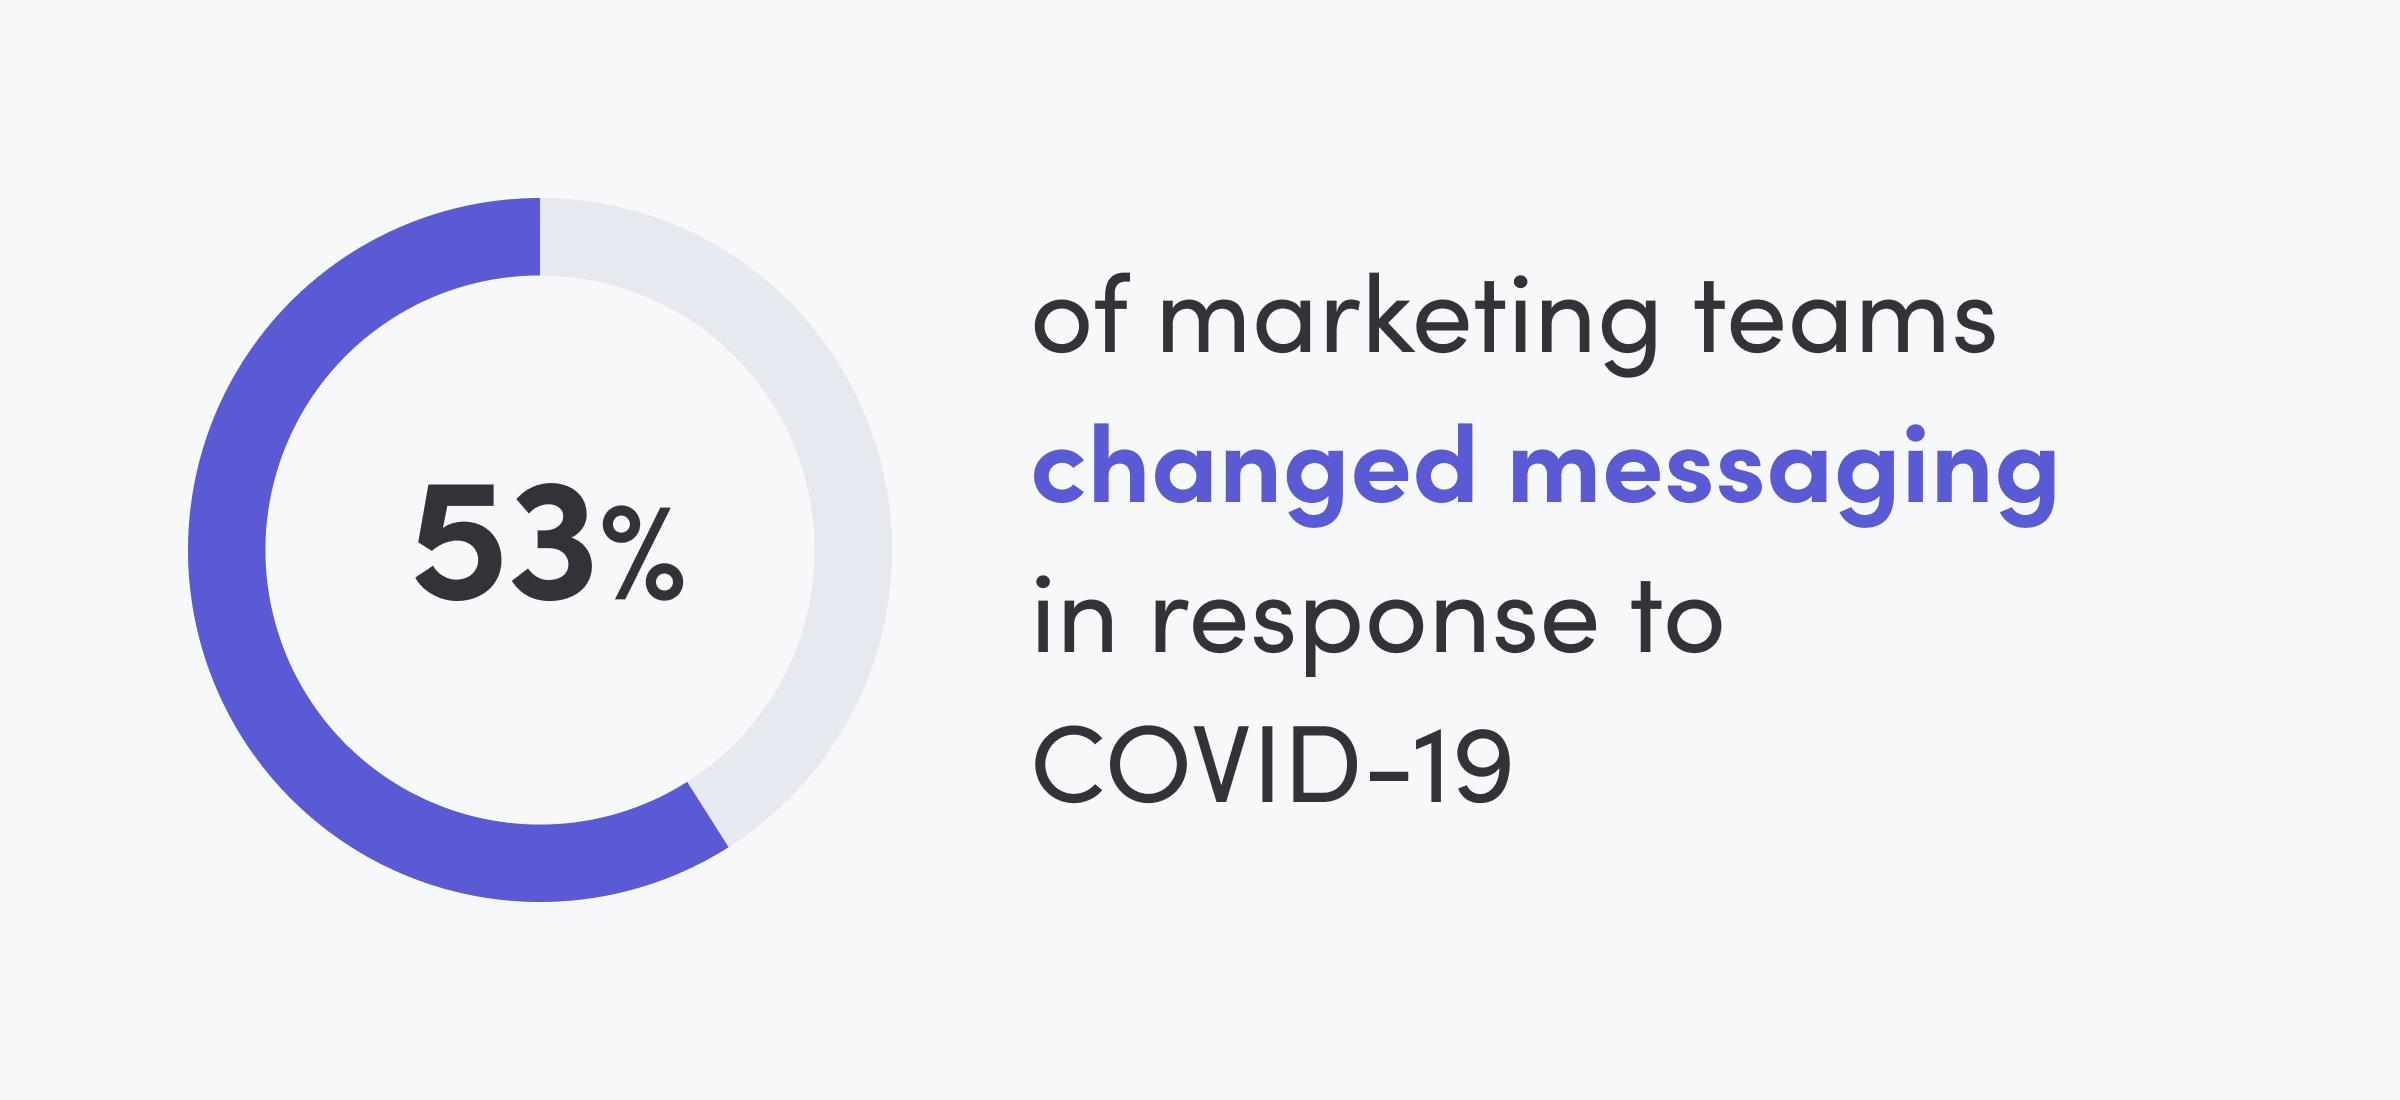 Crisis marketing: Messaging